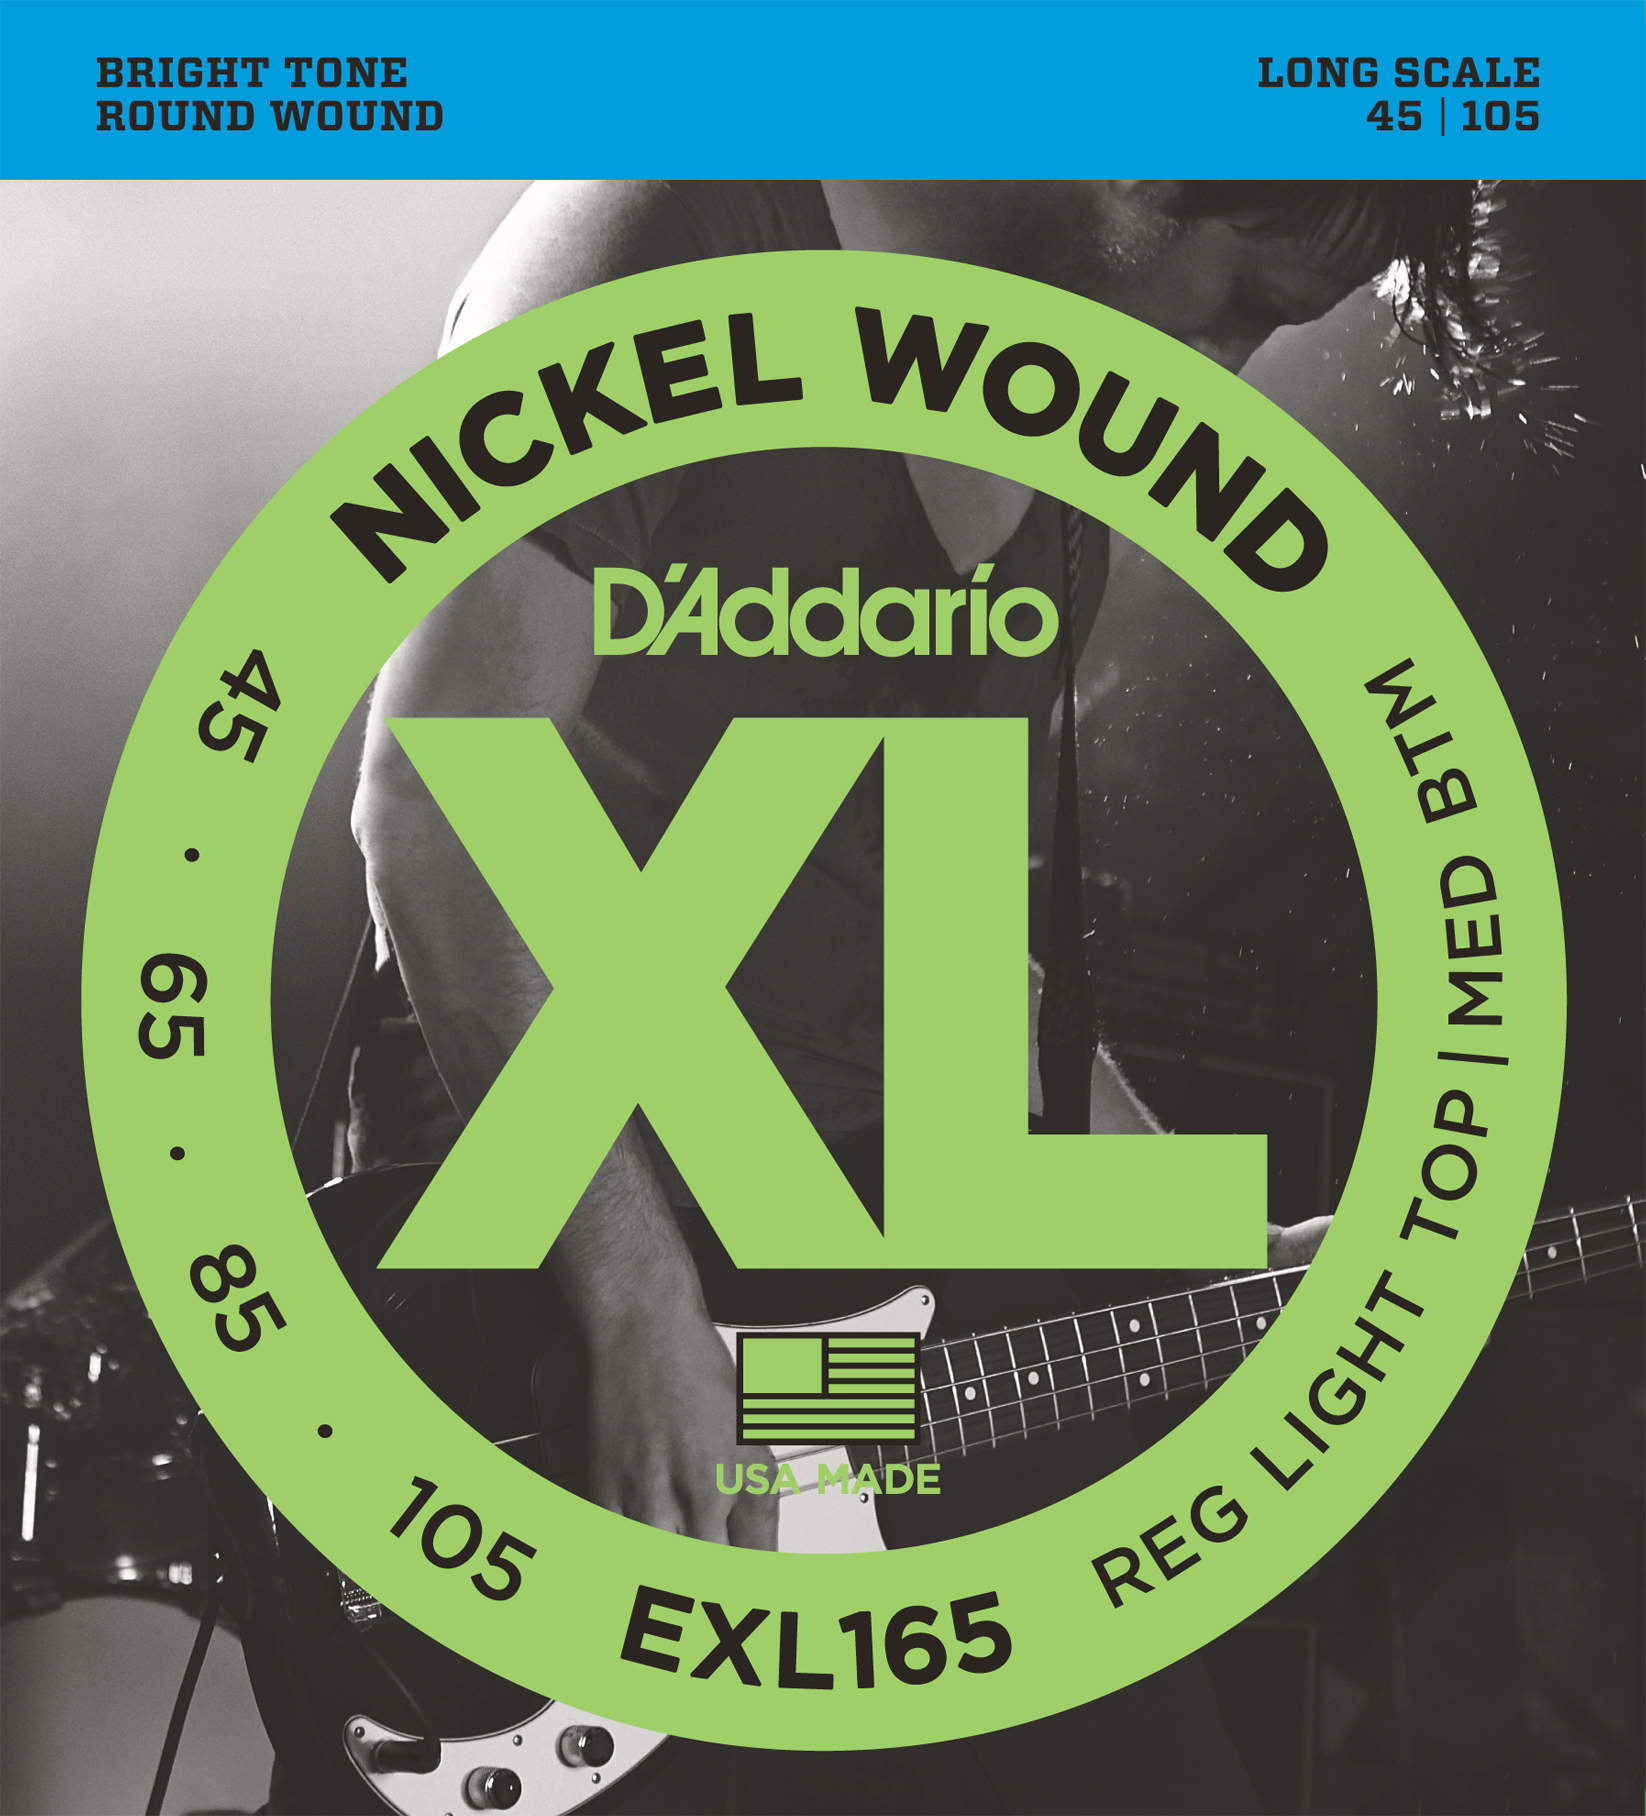 D'Addario EXL165 Nickel Wound Bass Guitar Strings, Custom Light, 45-105, Long Sc...